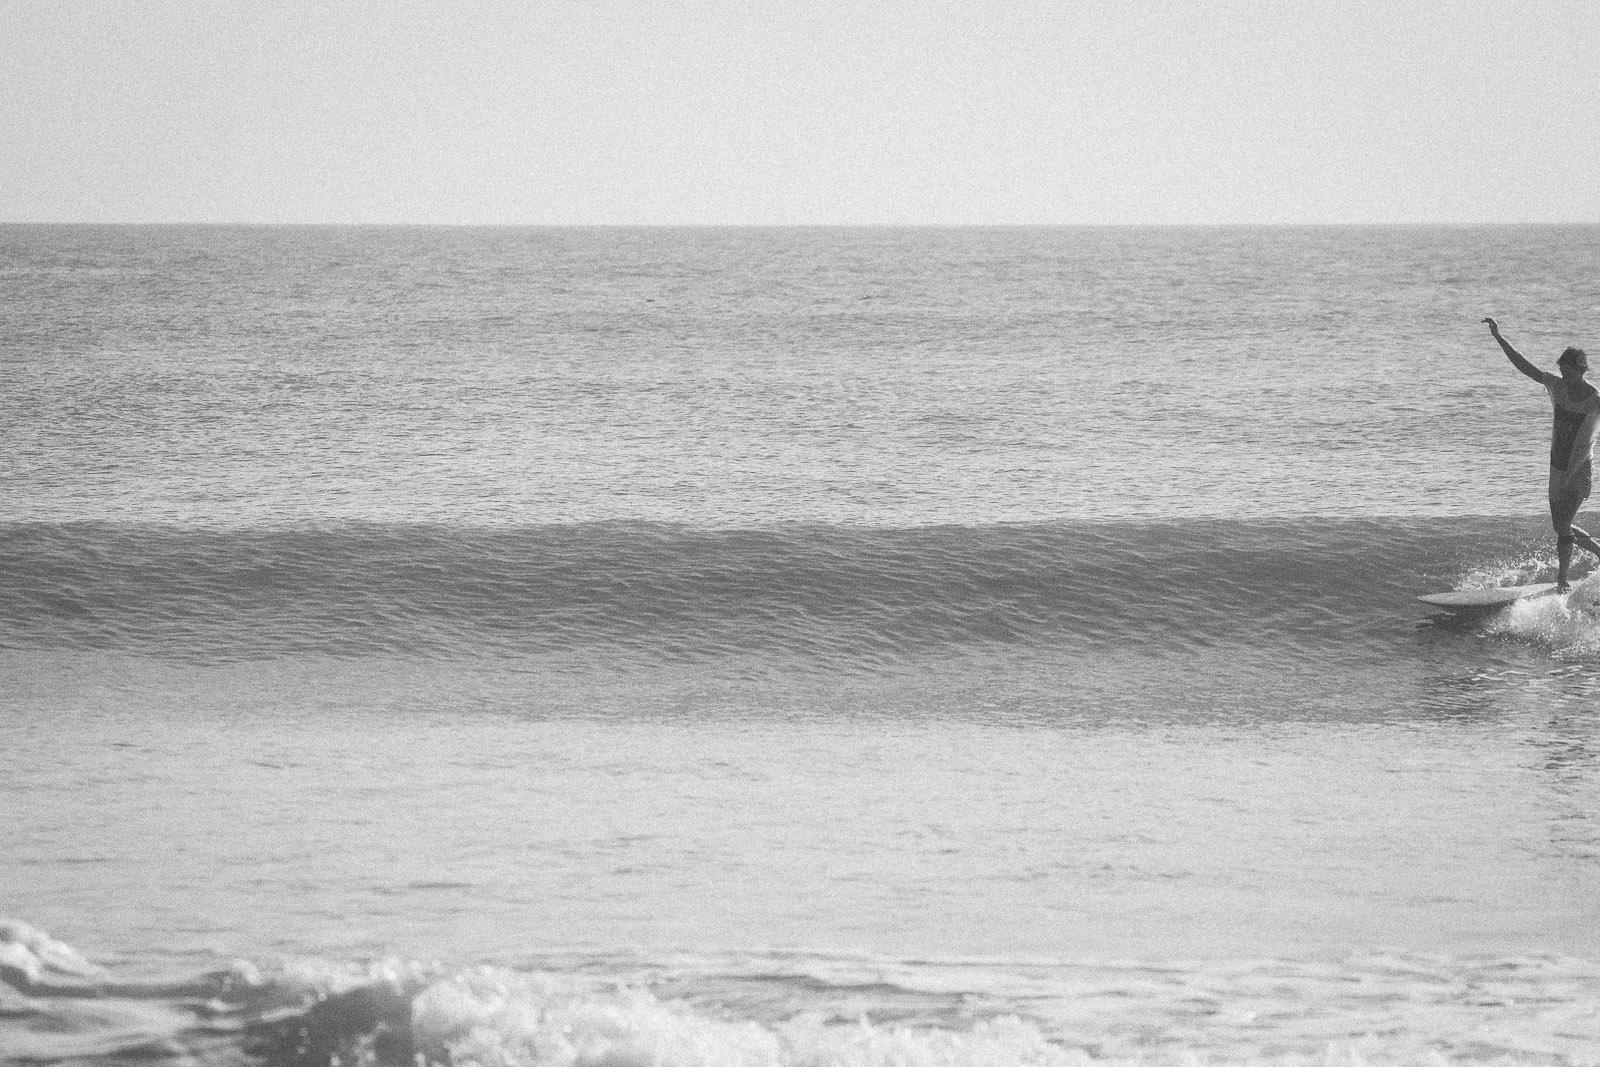 Sunshinestories-surf-travel-blog-IMG_9302